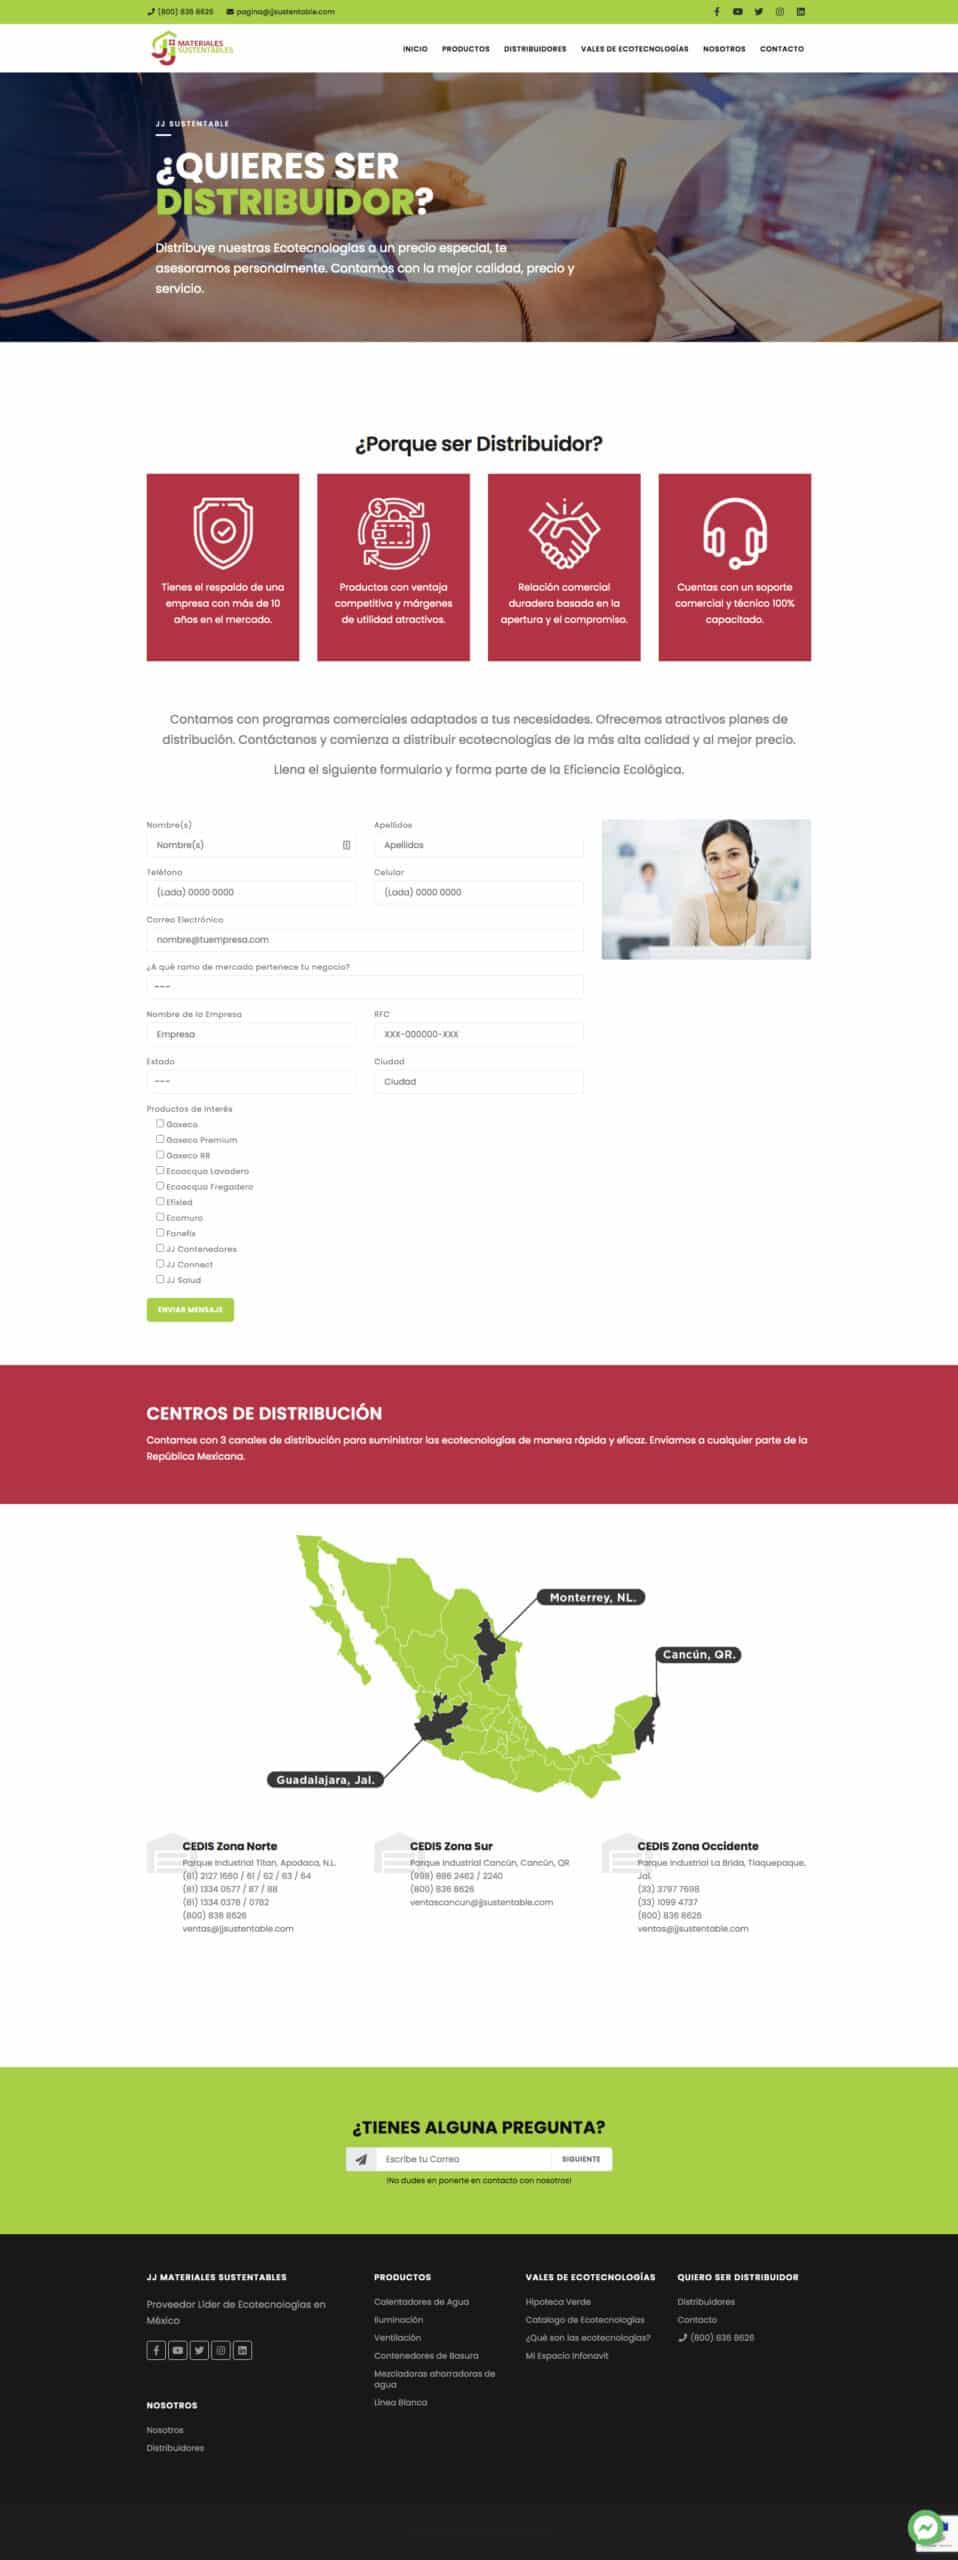 JJ Sustentable - Distribuidores